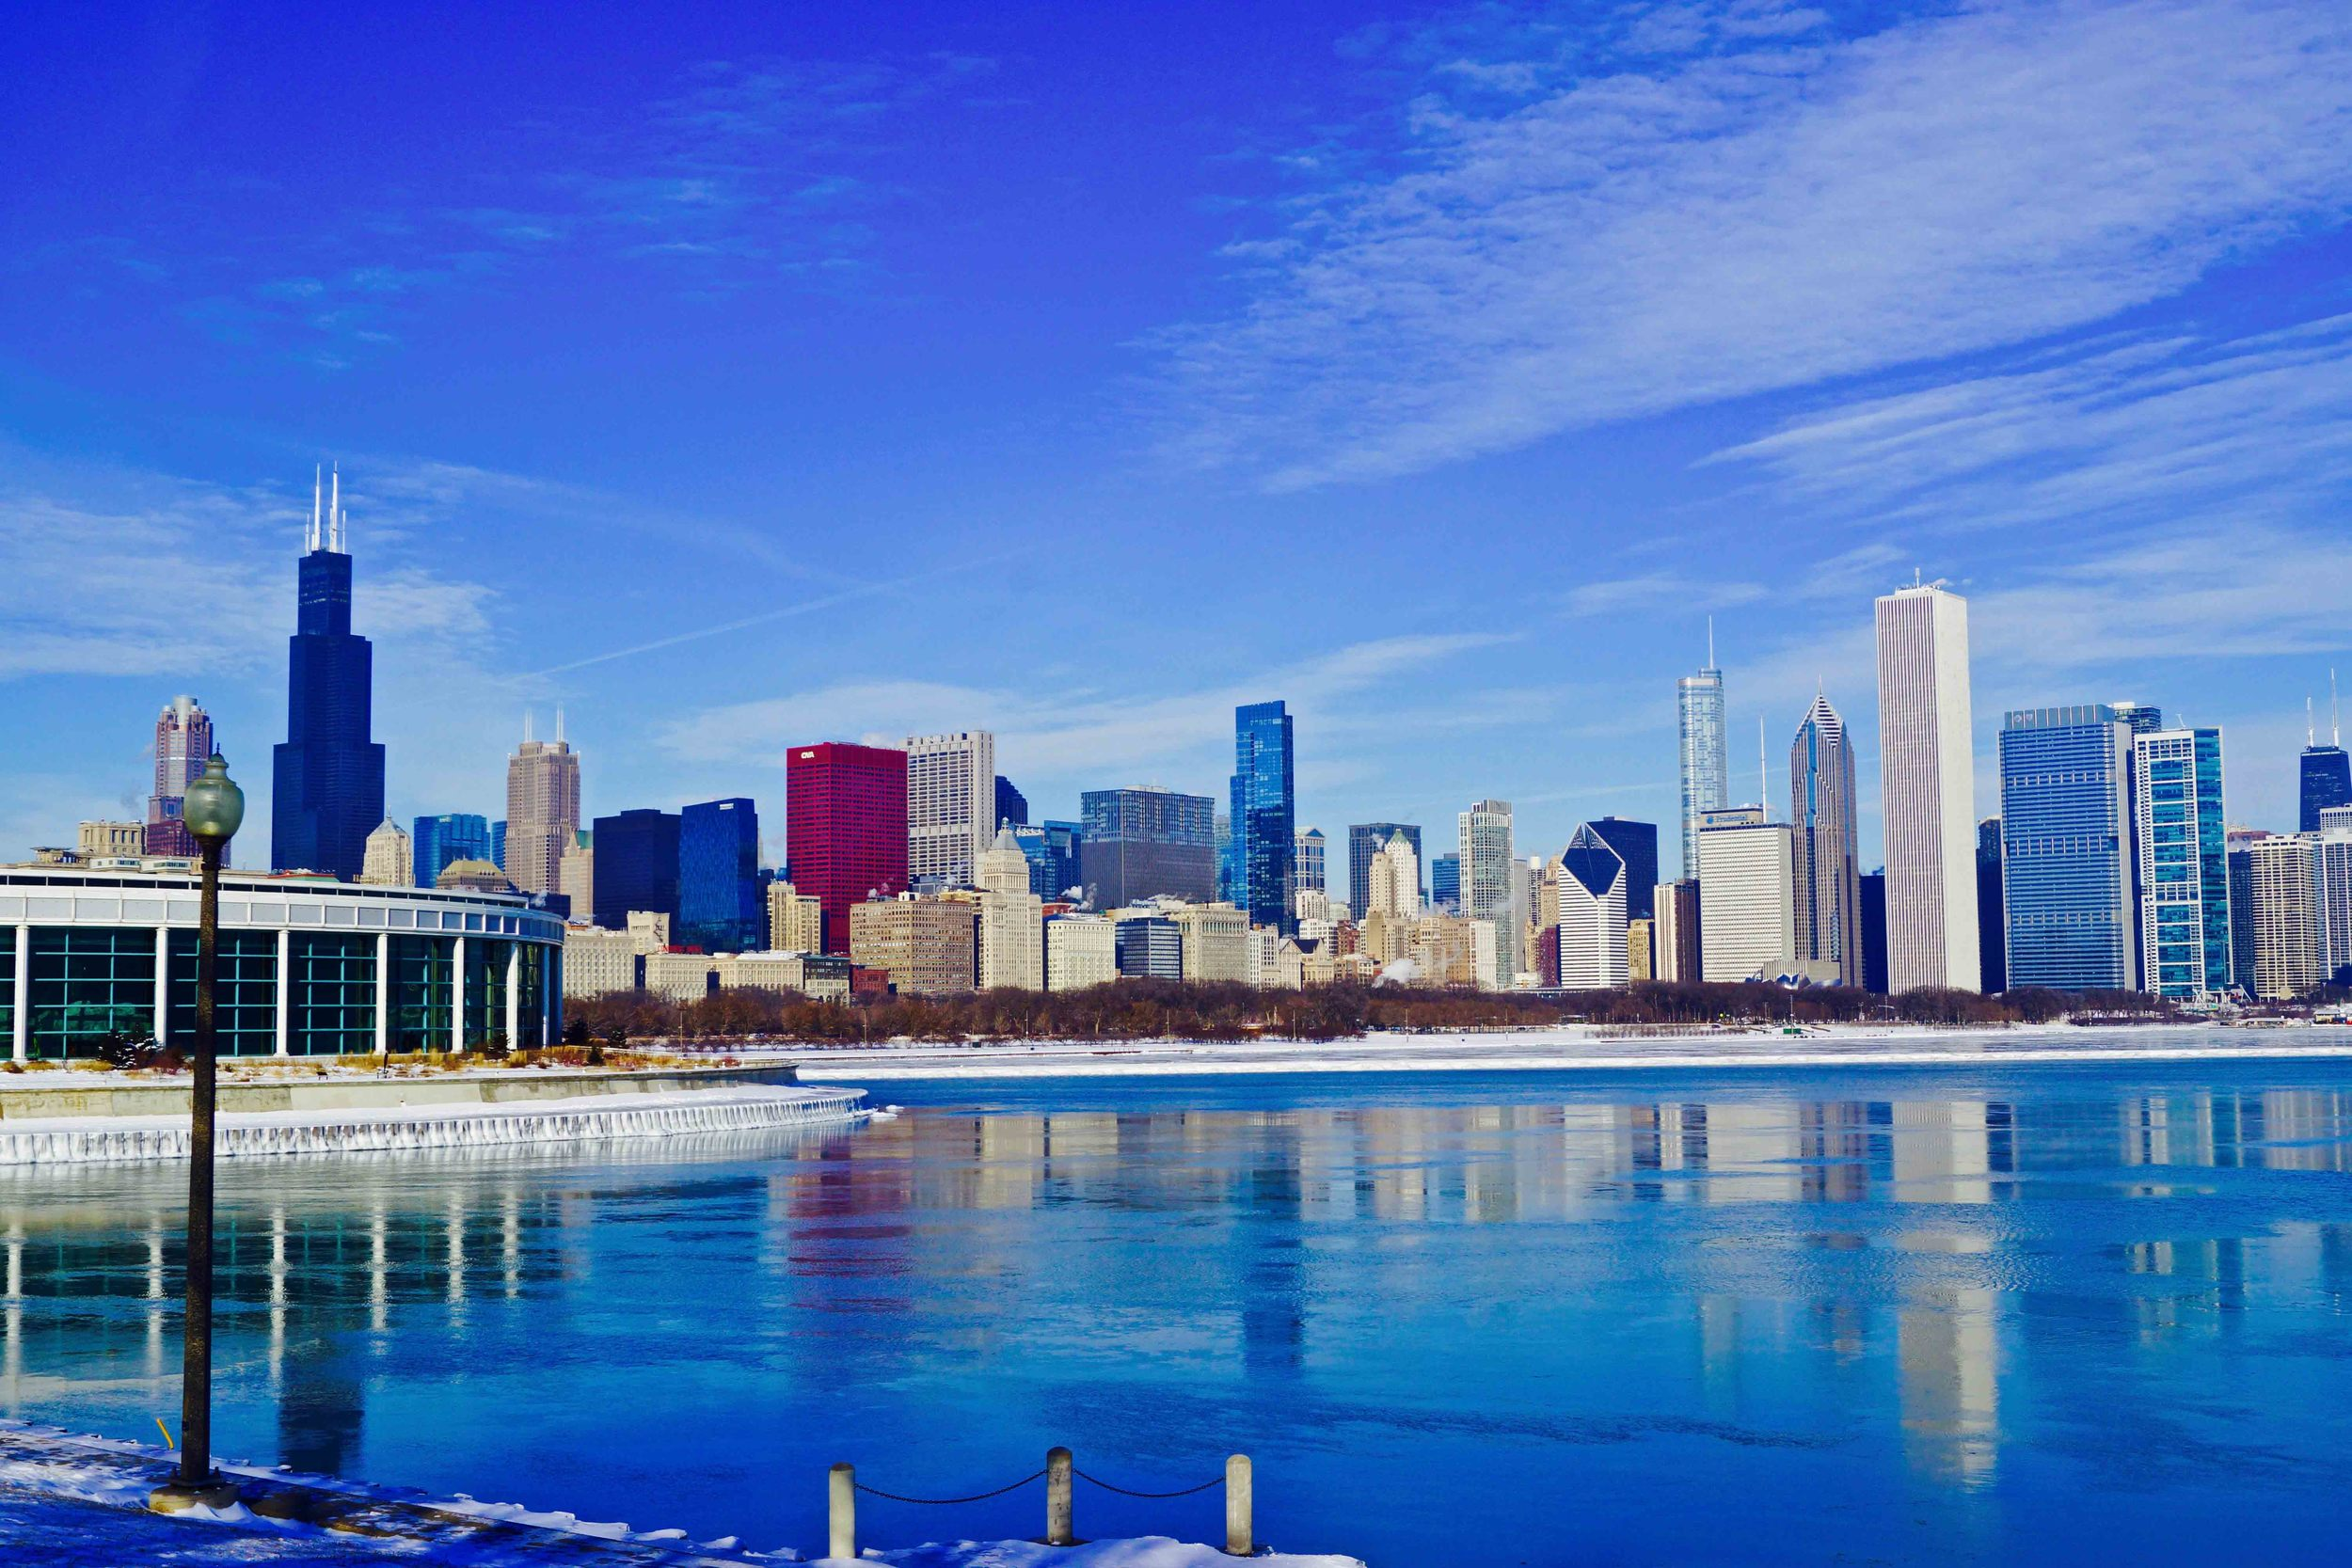 Chicago, January 2015